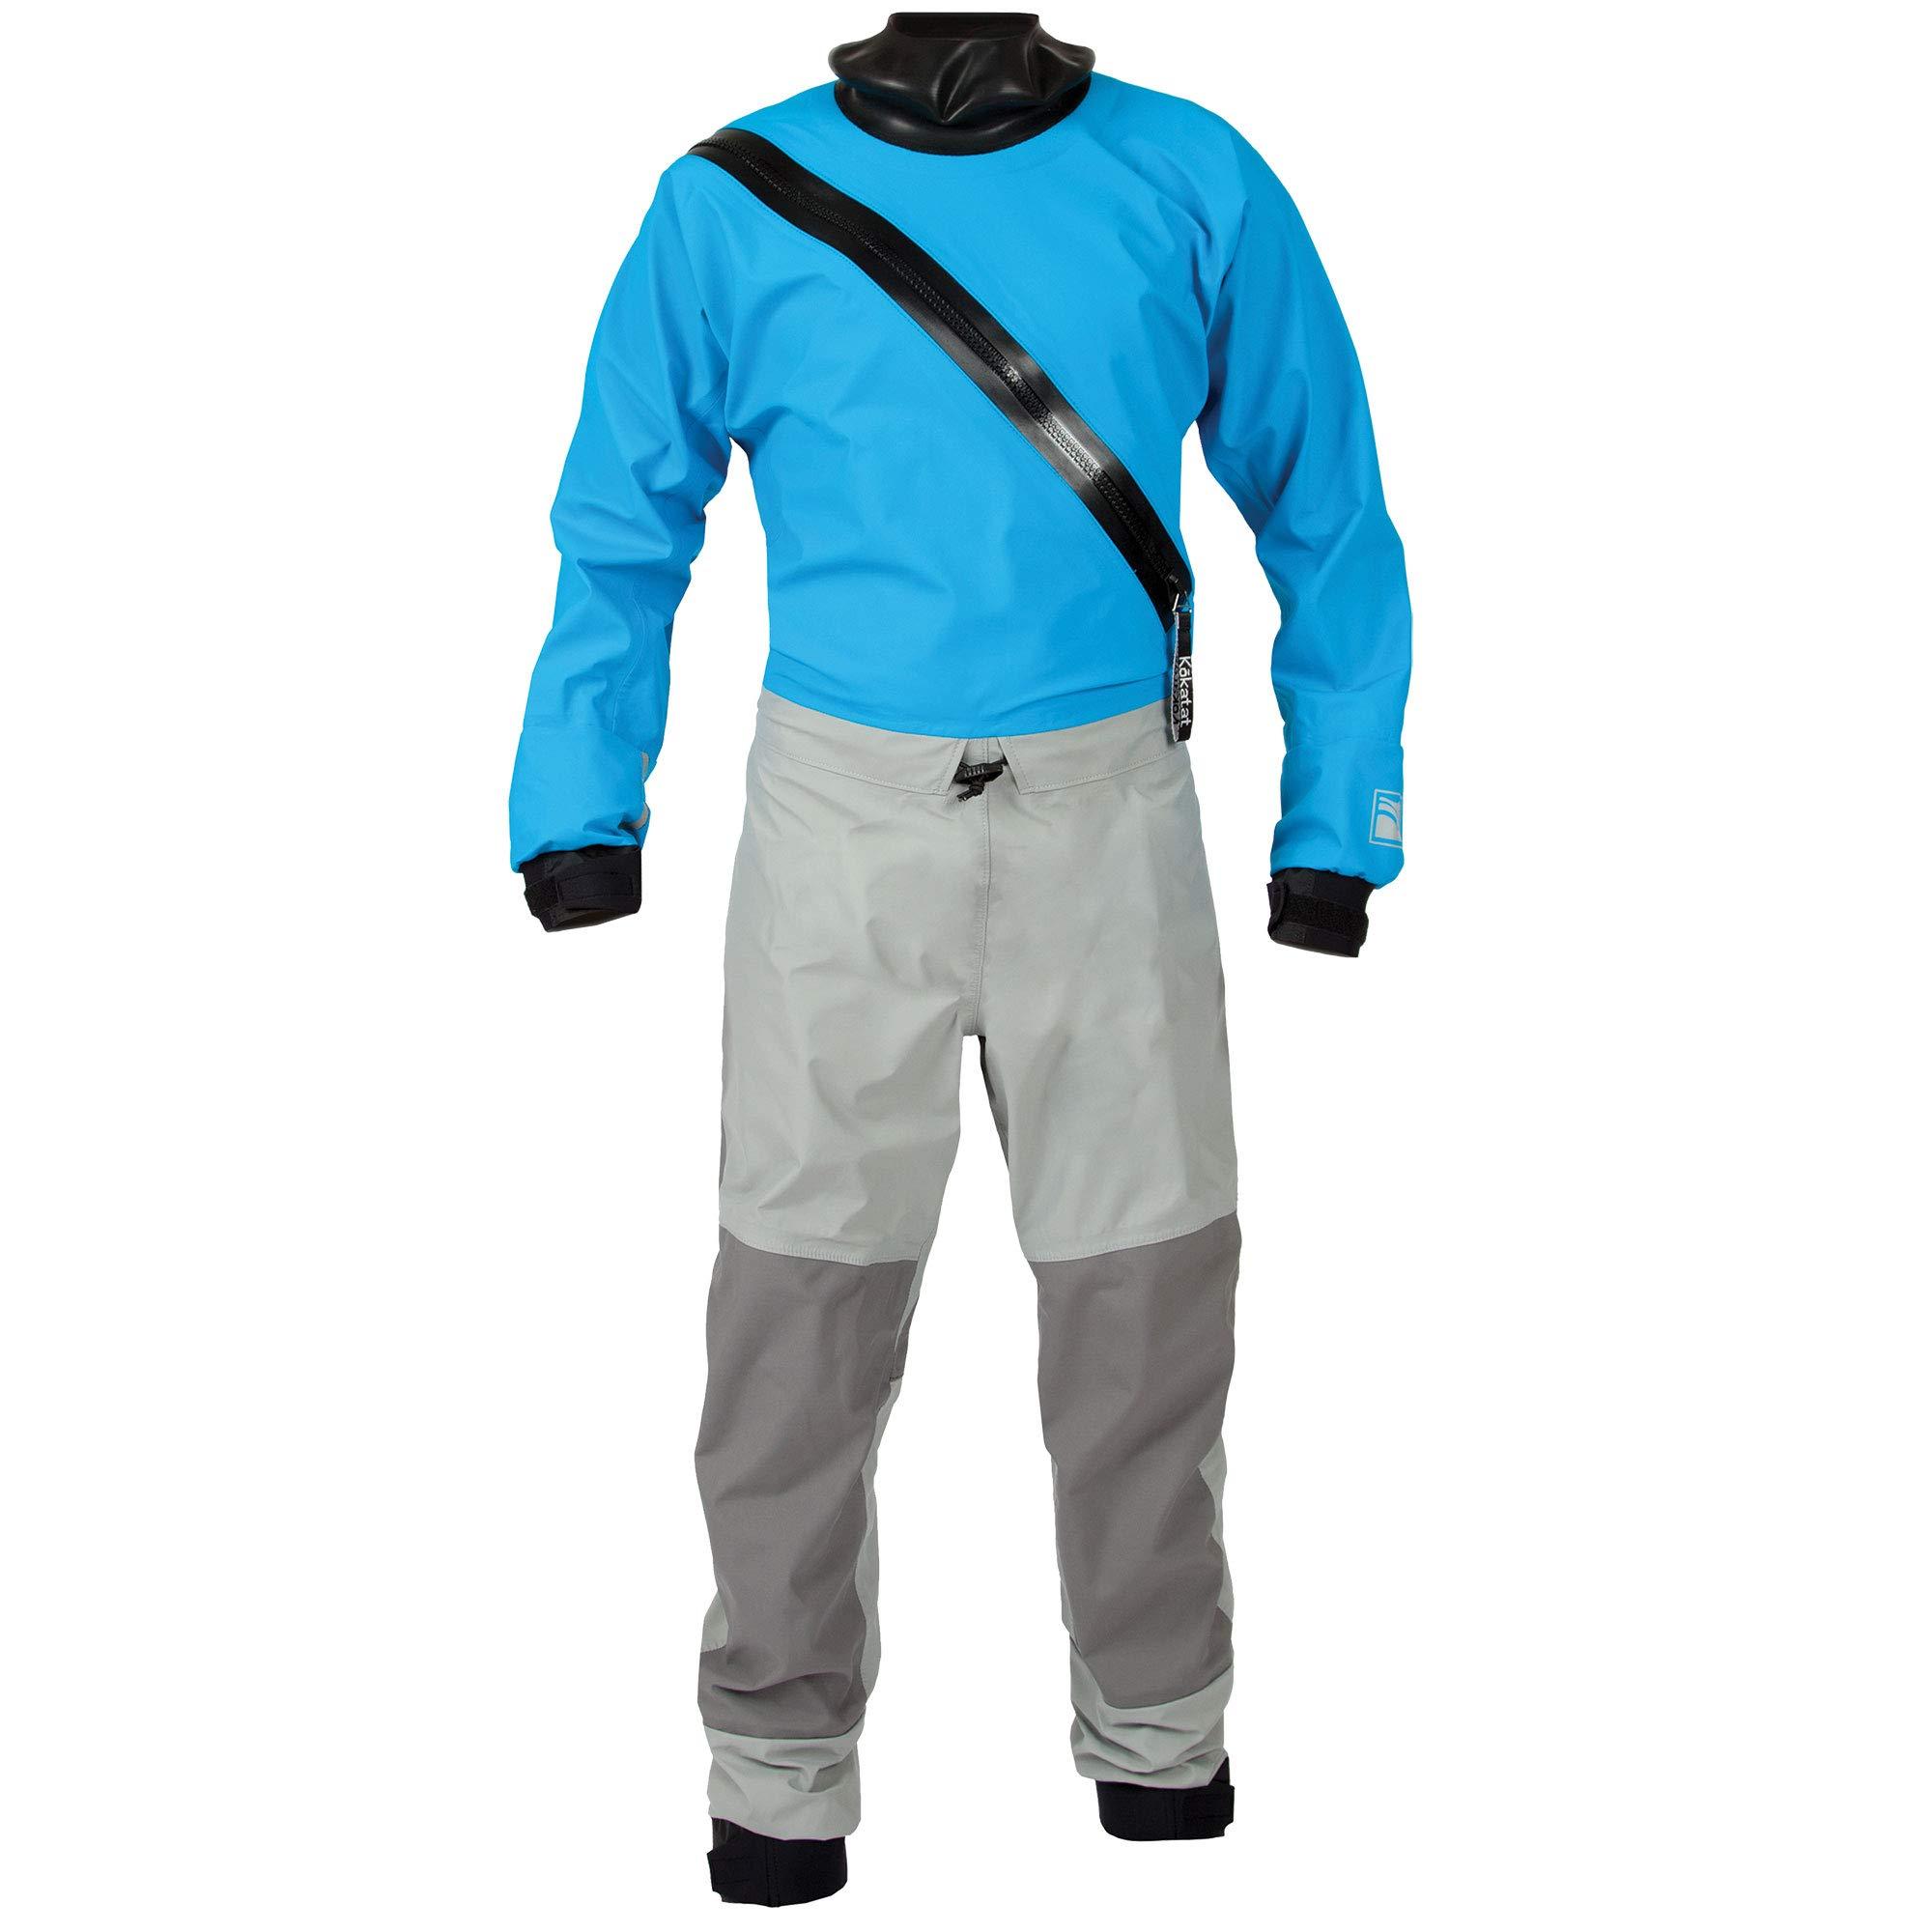 Kokatat Men's Hydrus Swift Entry Drysuit-Electric Blue-XXL